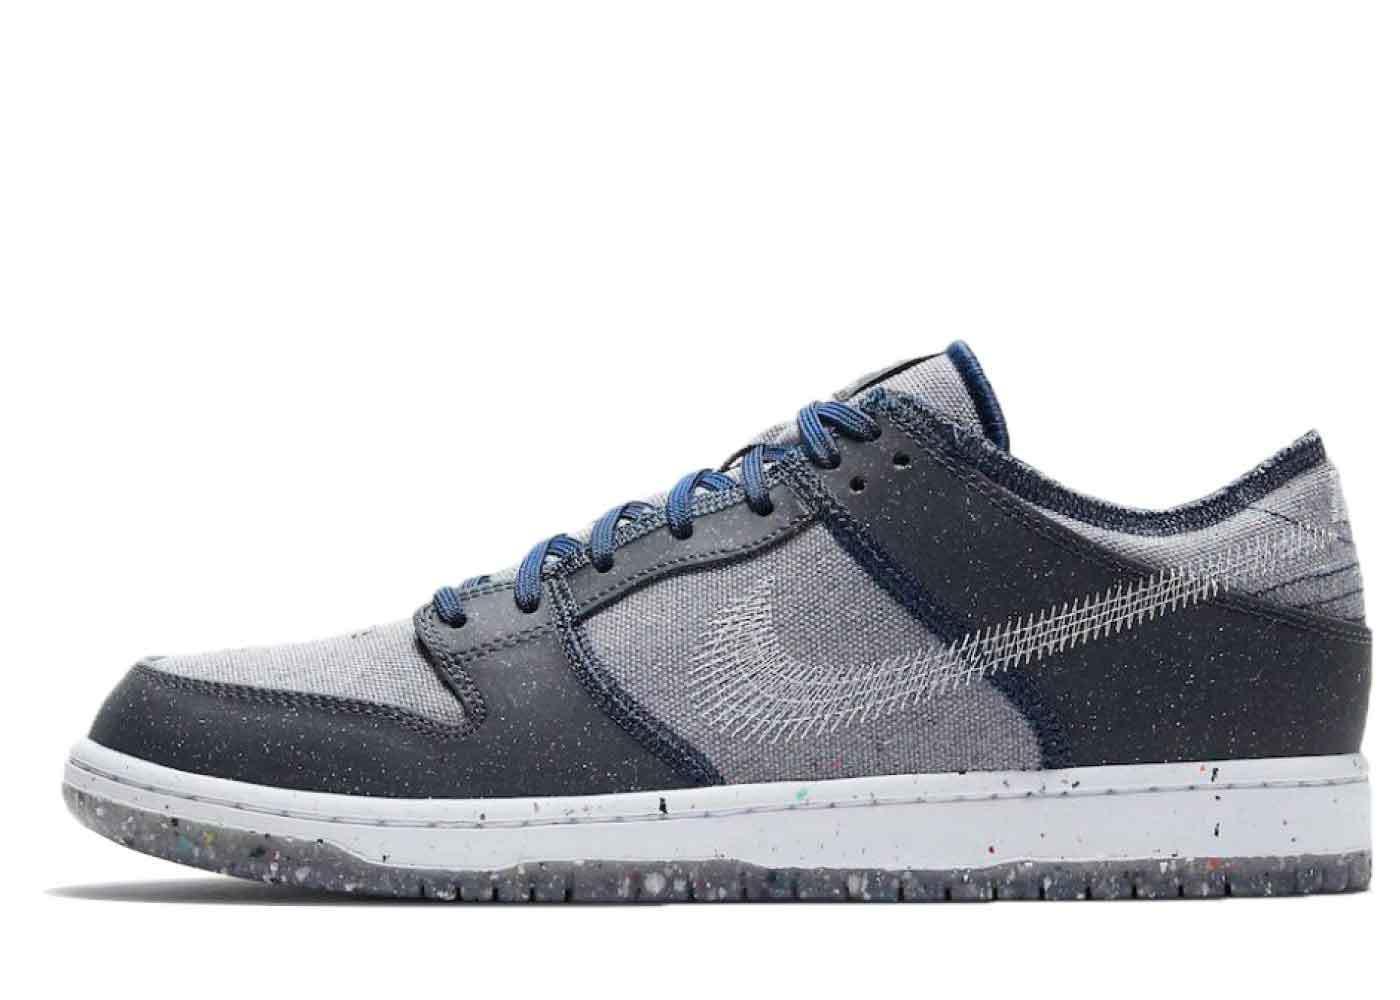 Nike SB Dunk Low Pro Crater Dark Greyの写真